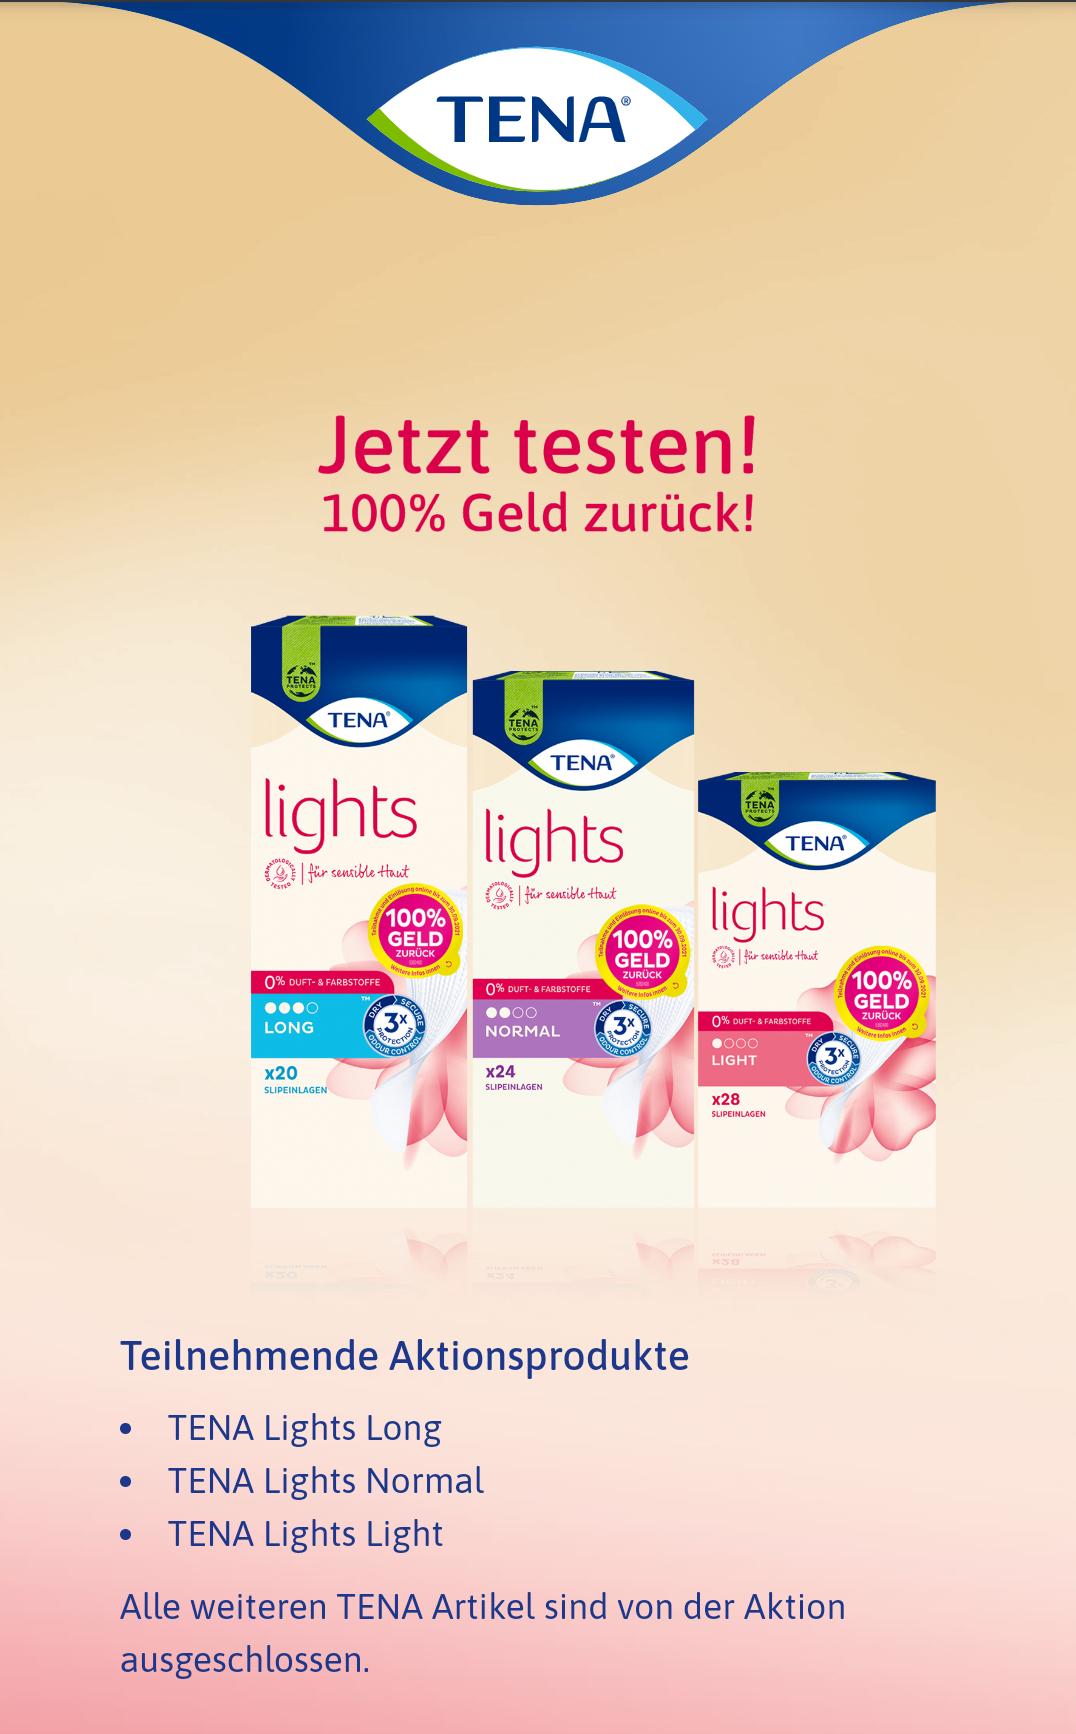 [GzG] TENA lights gratis testen